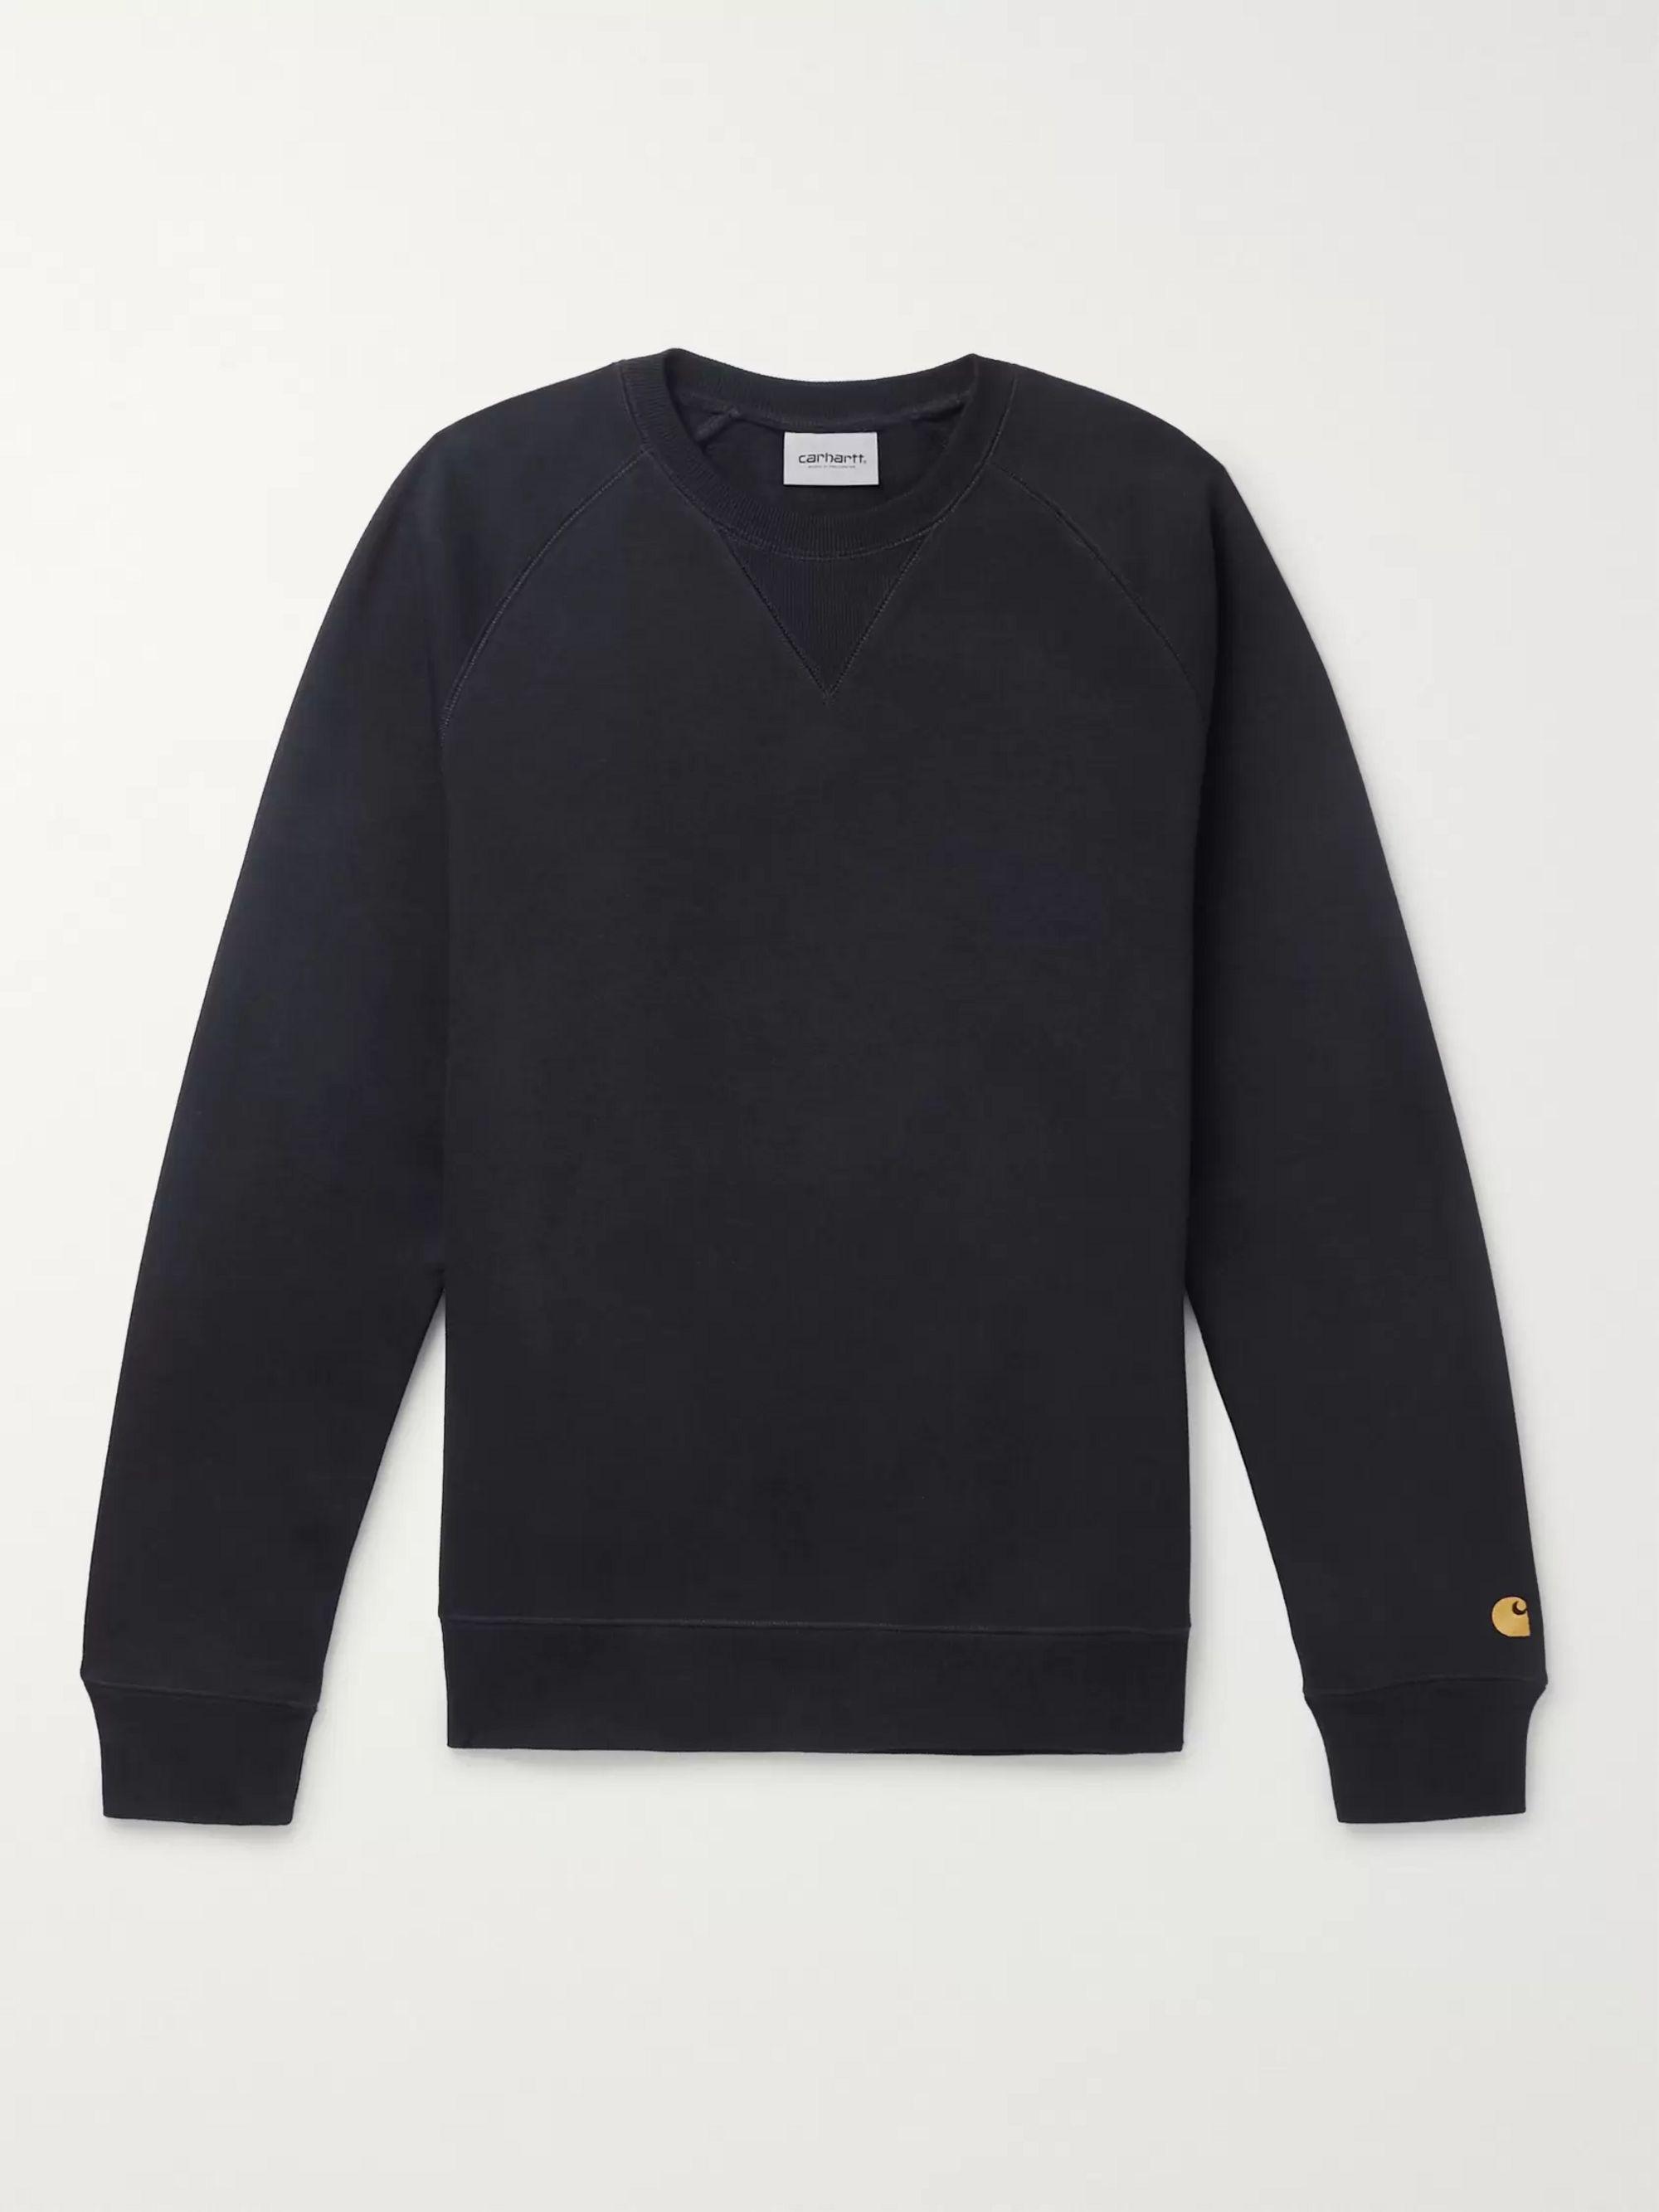 Chase Mélange Fleece Back Cotton Blend Jersey Sweatshirt